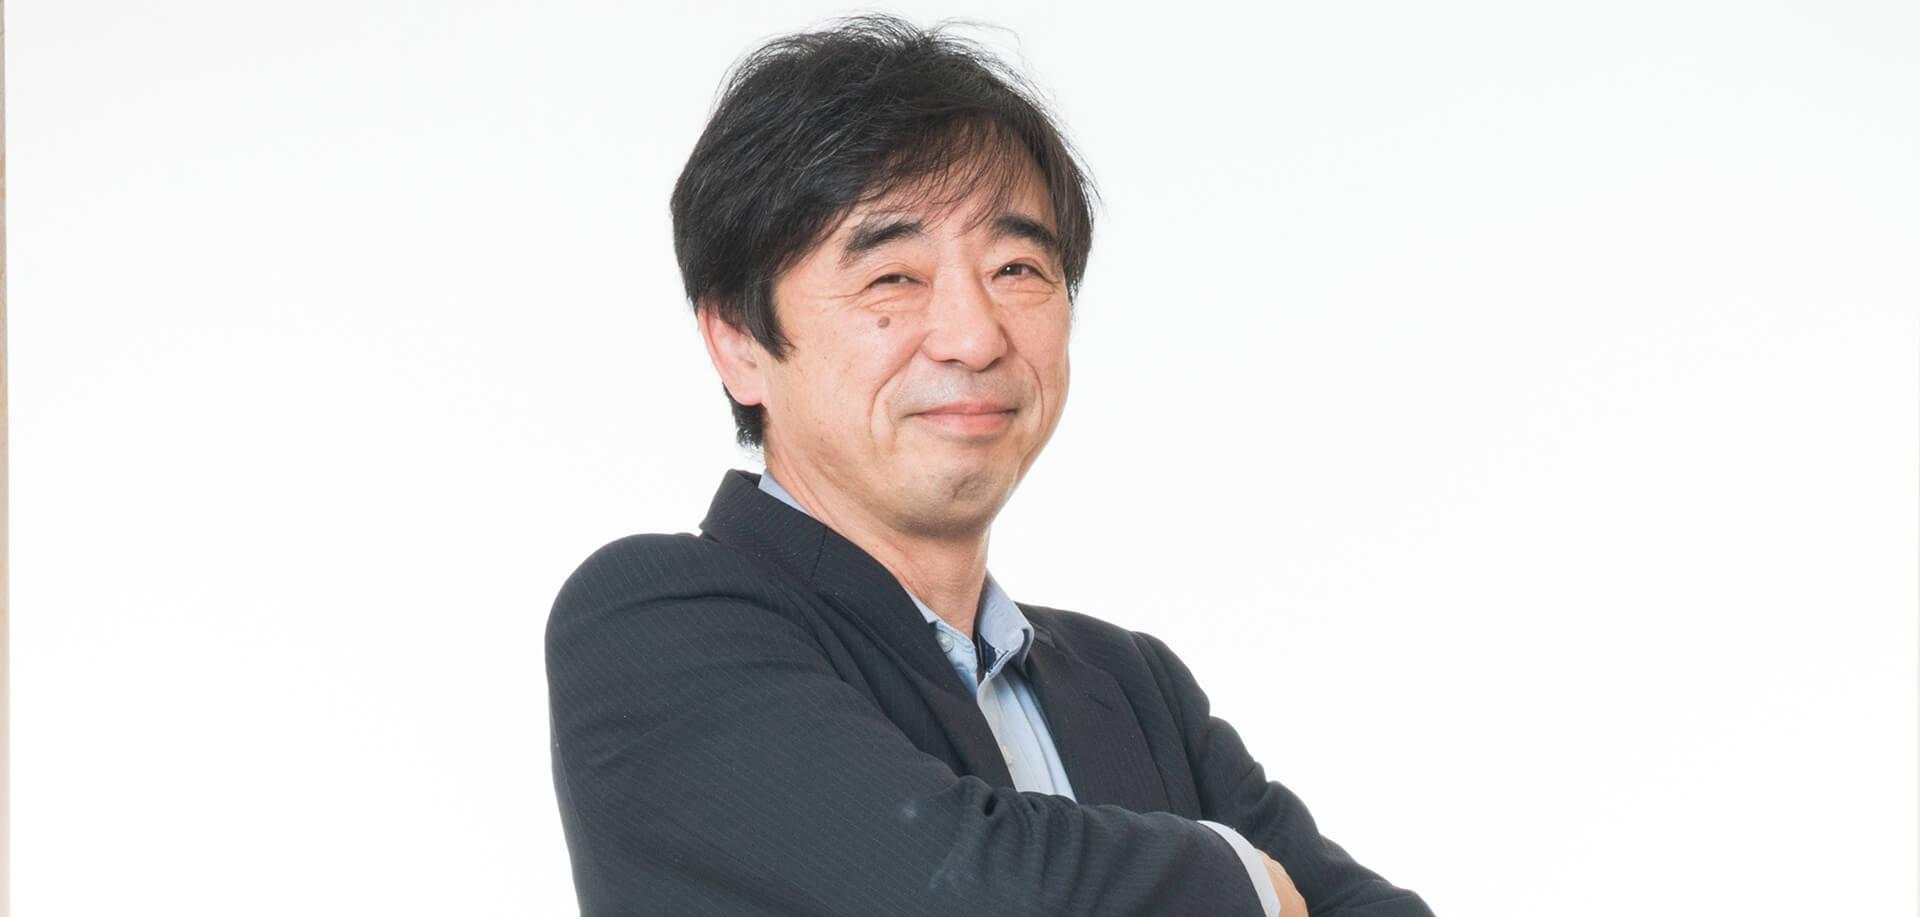 めざせ!【東京理科大学】理学部数学科⇒ 評判、偏 …